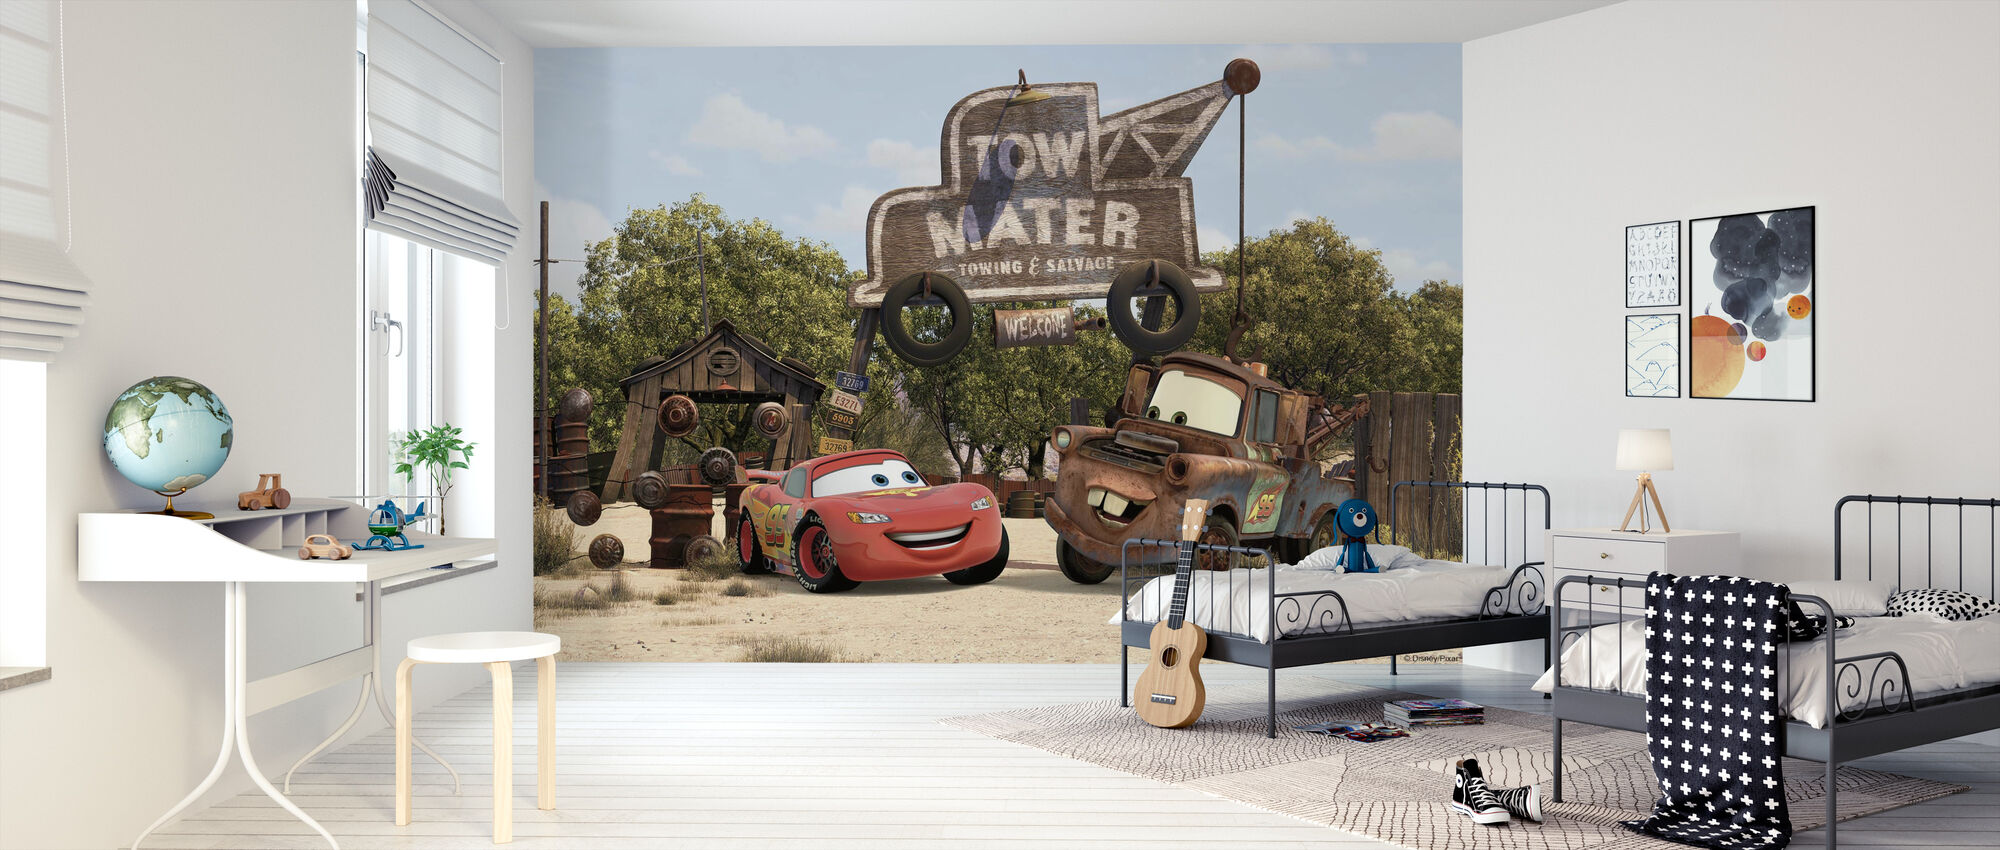 Biler - Tow Mater - Tapet - Barnerom